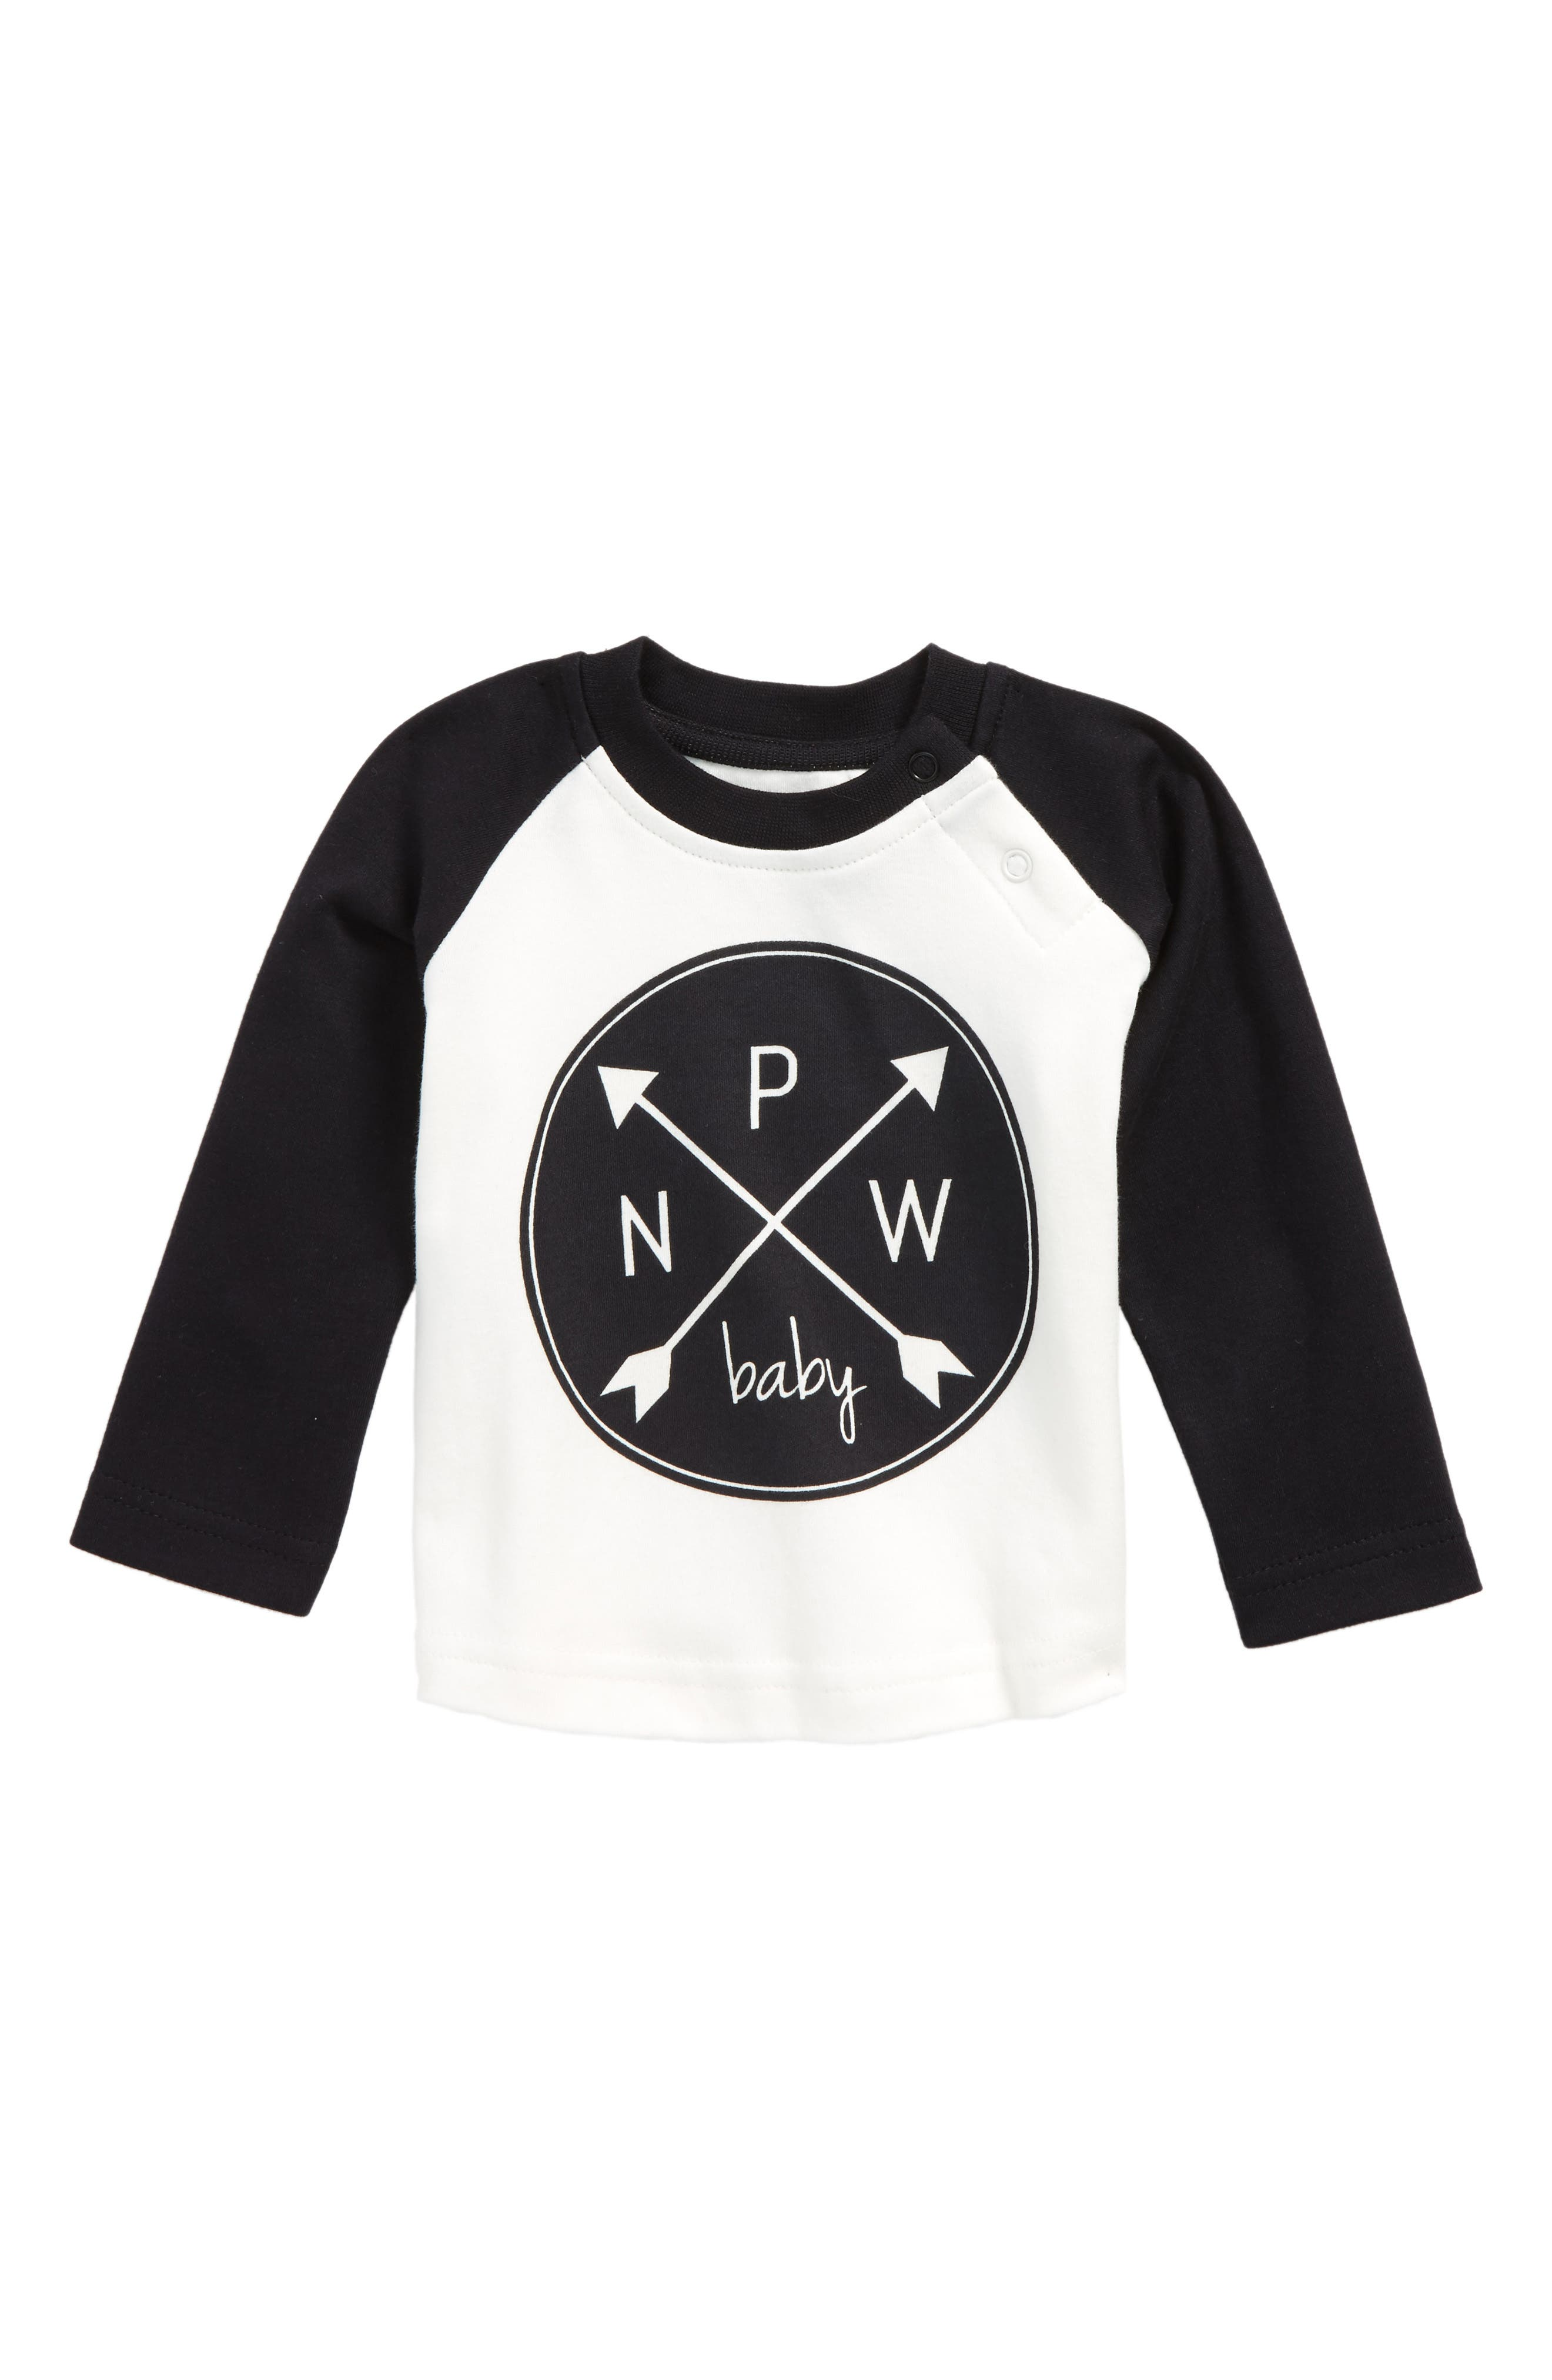 Main Image - City Mouse PNW Logo Organic Cotton T-Shirt (Baby)